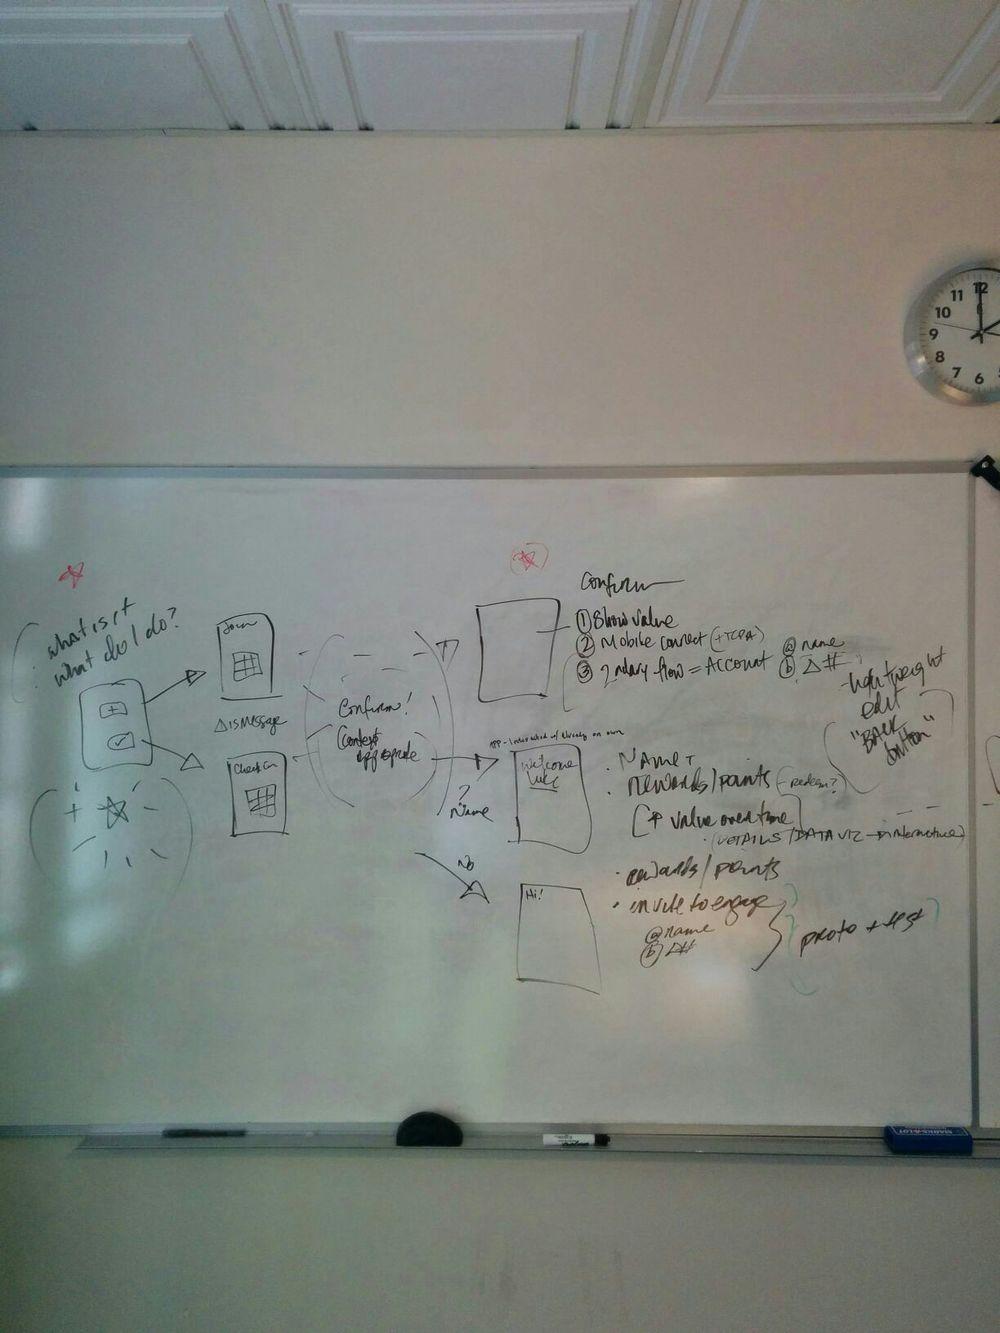 Initial brainstorm output - CTS pilot